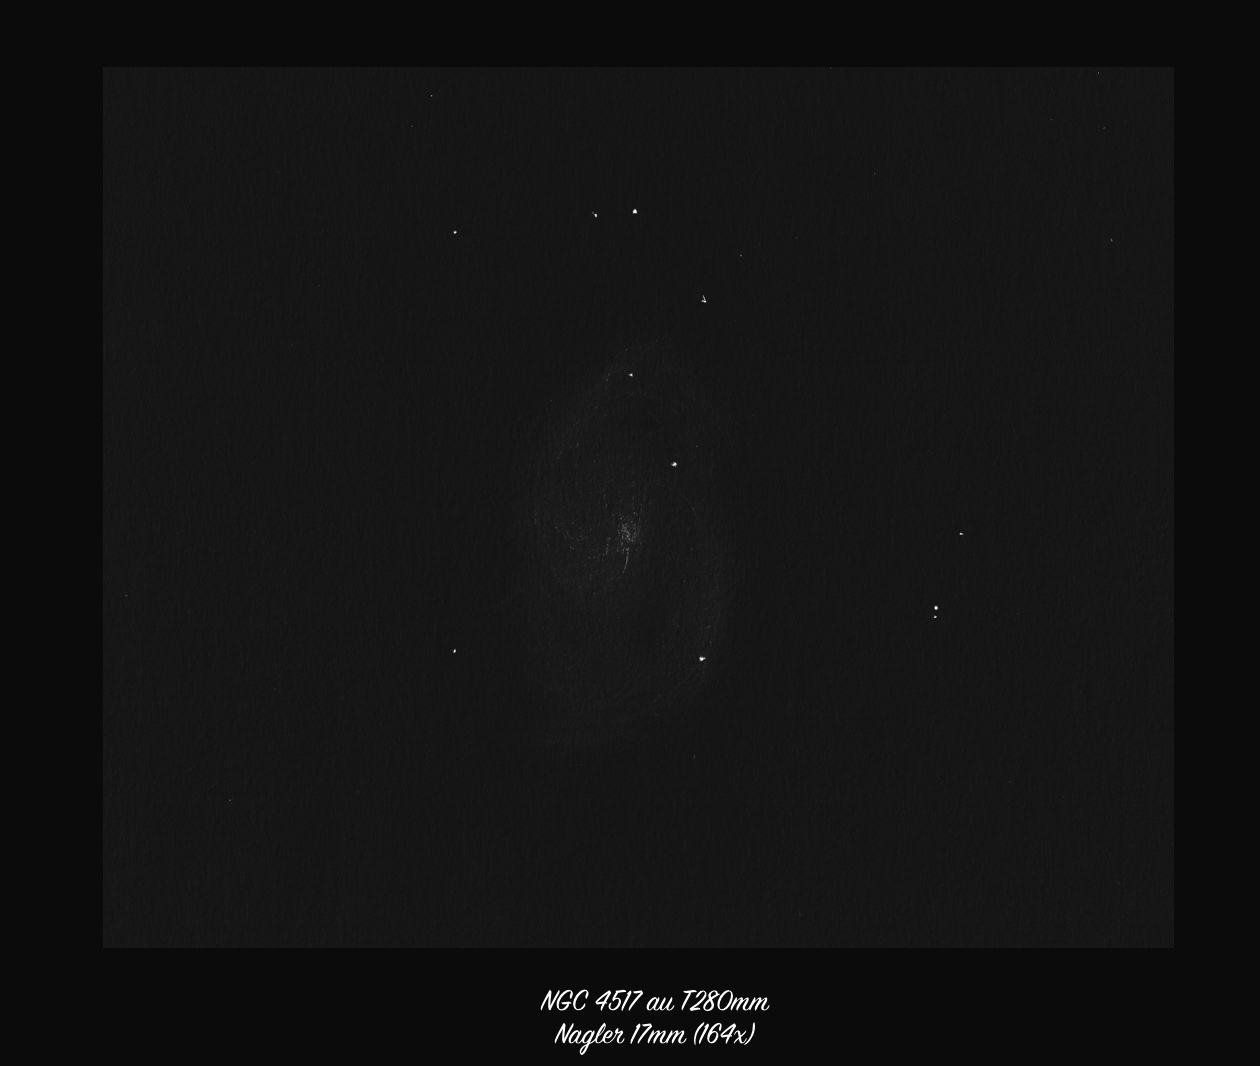 5aa7c1fef16db_galaxieNGC2997.jpg.a97f65cf3575f4f889a1075c44811085.jpg